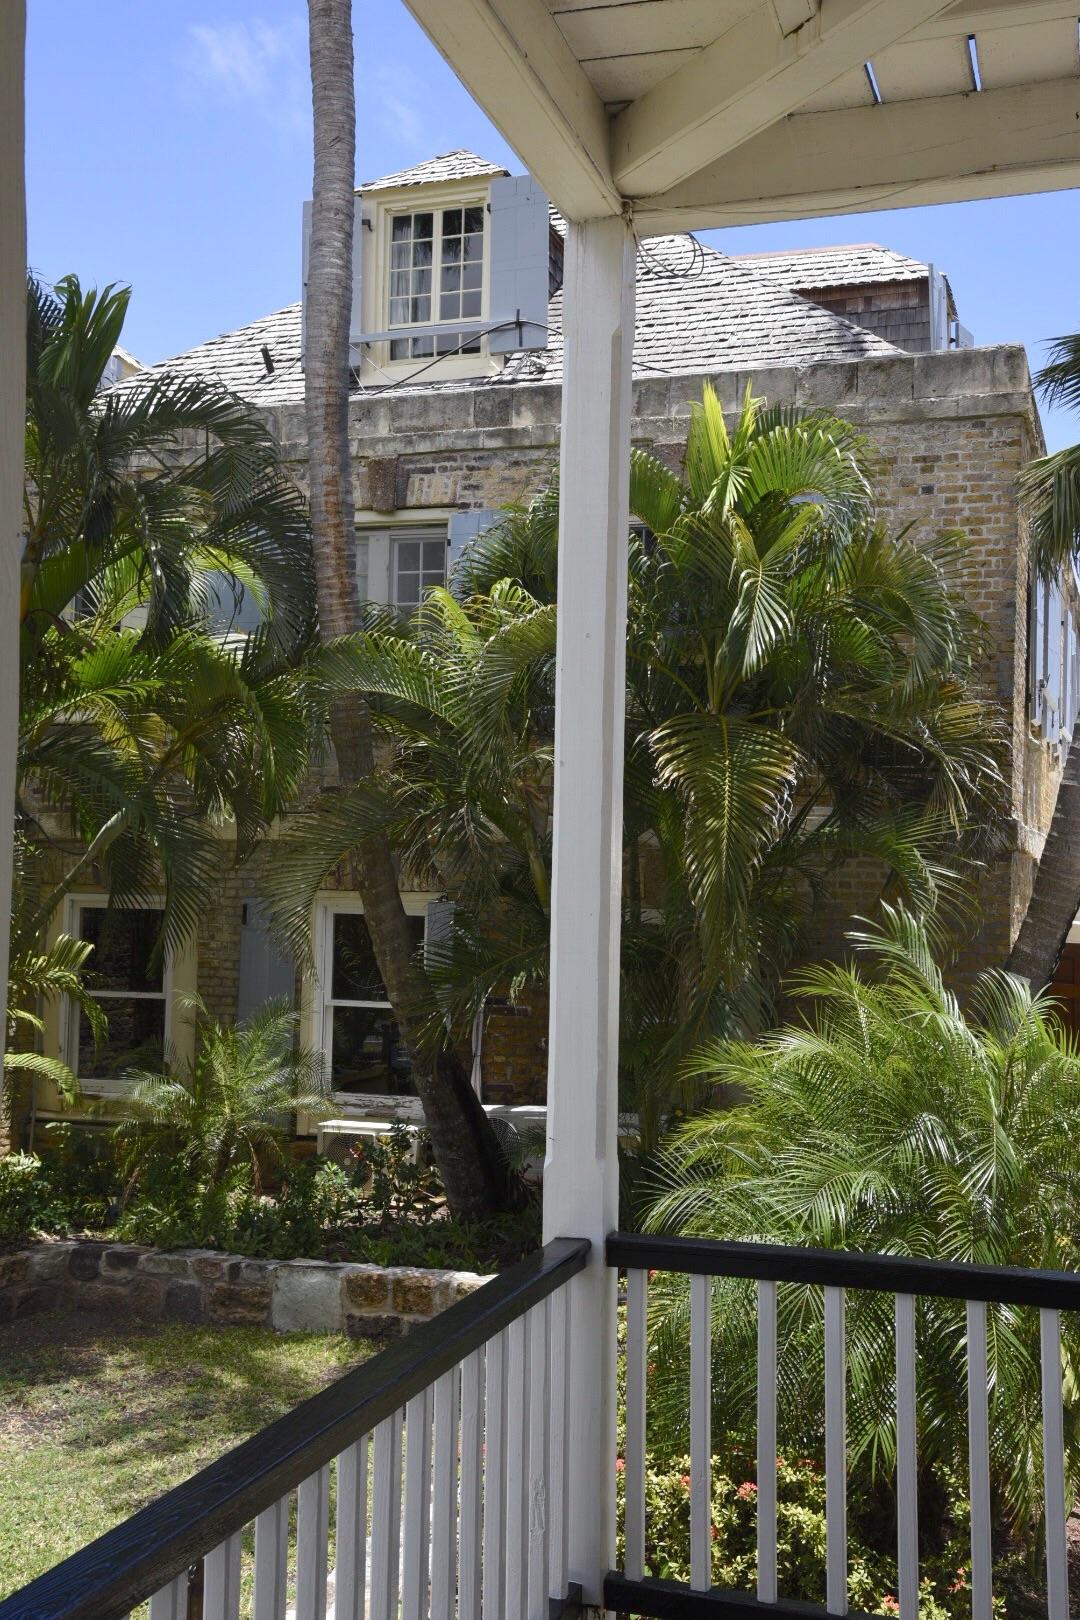 Beautifully restored Colonial era buildings in Nelsons Dockyard.